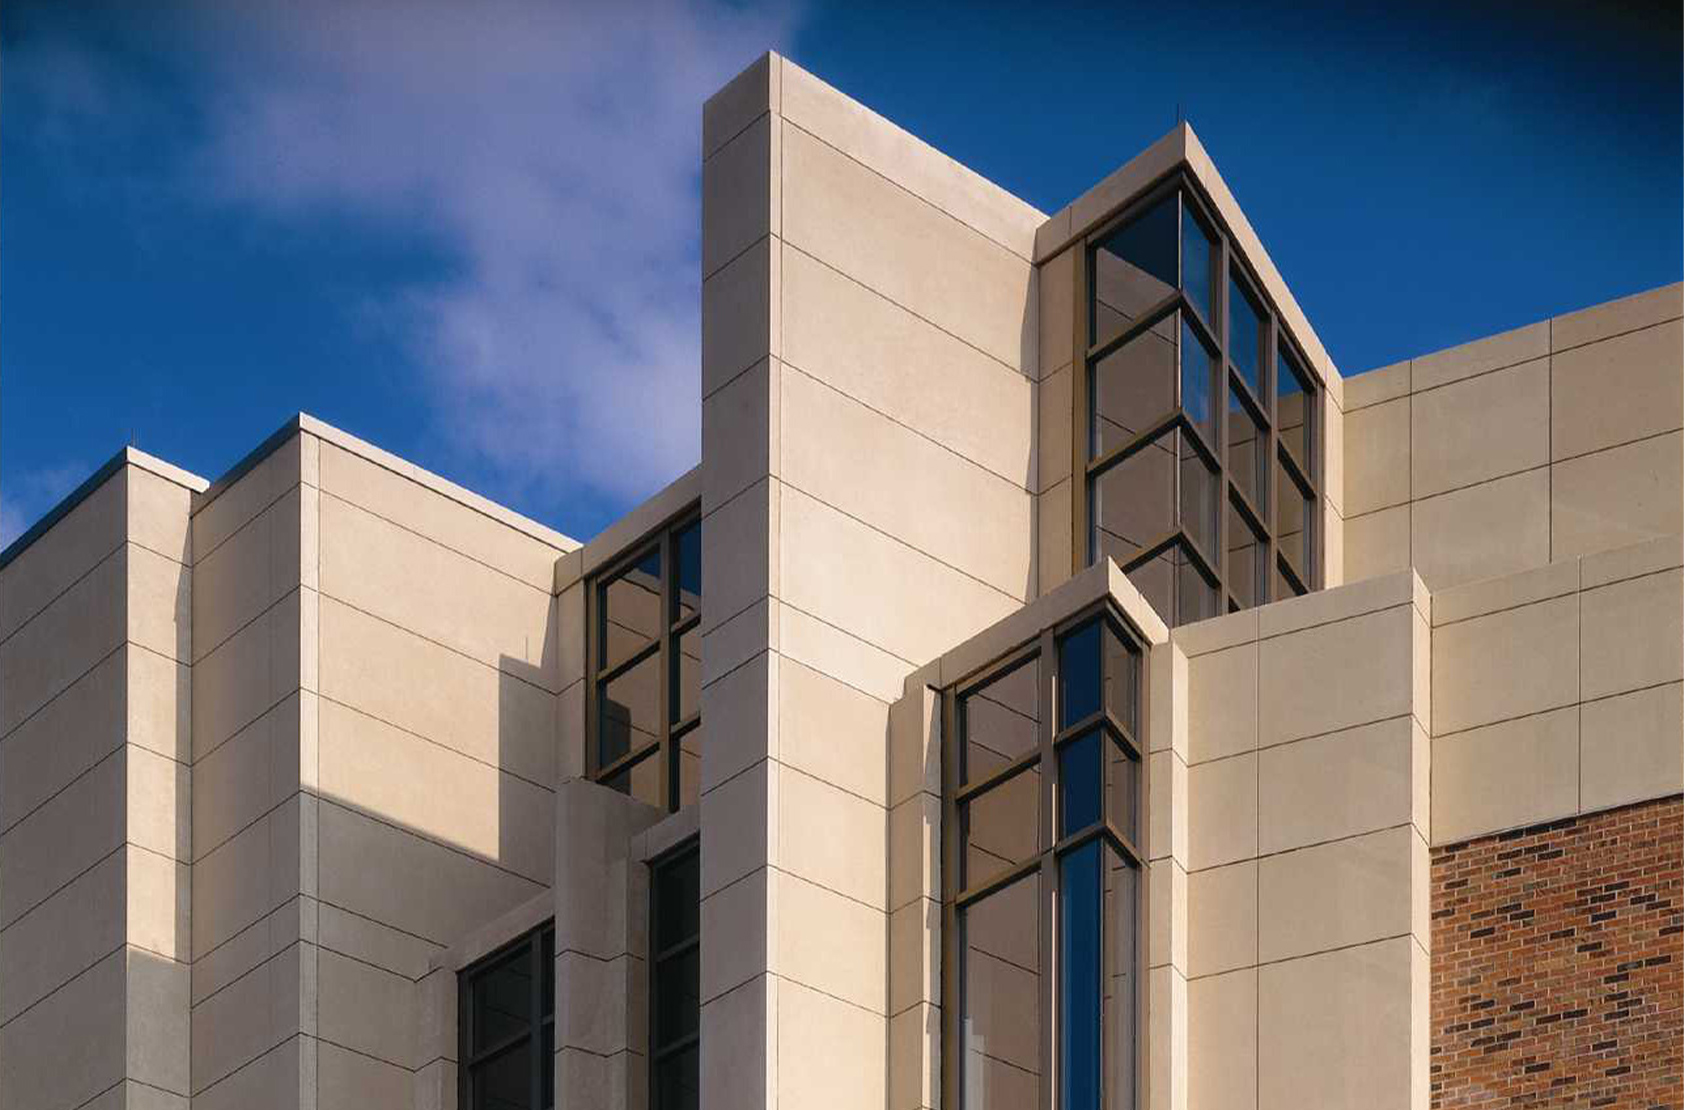 University of Wisconsin - Madison - Biochemistry Building